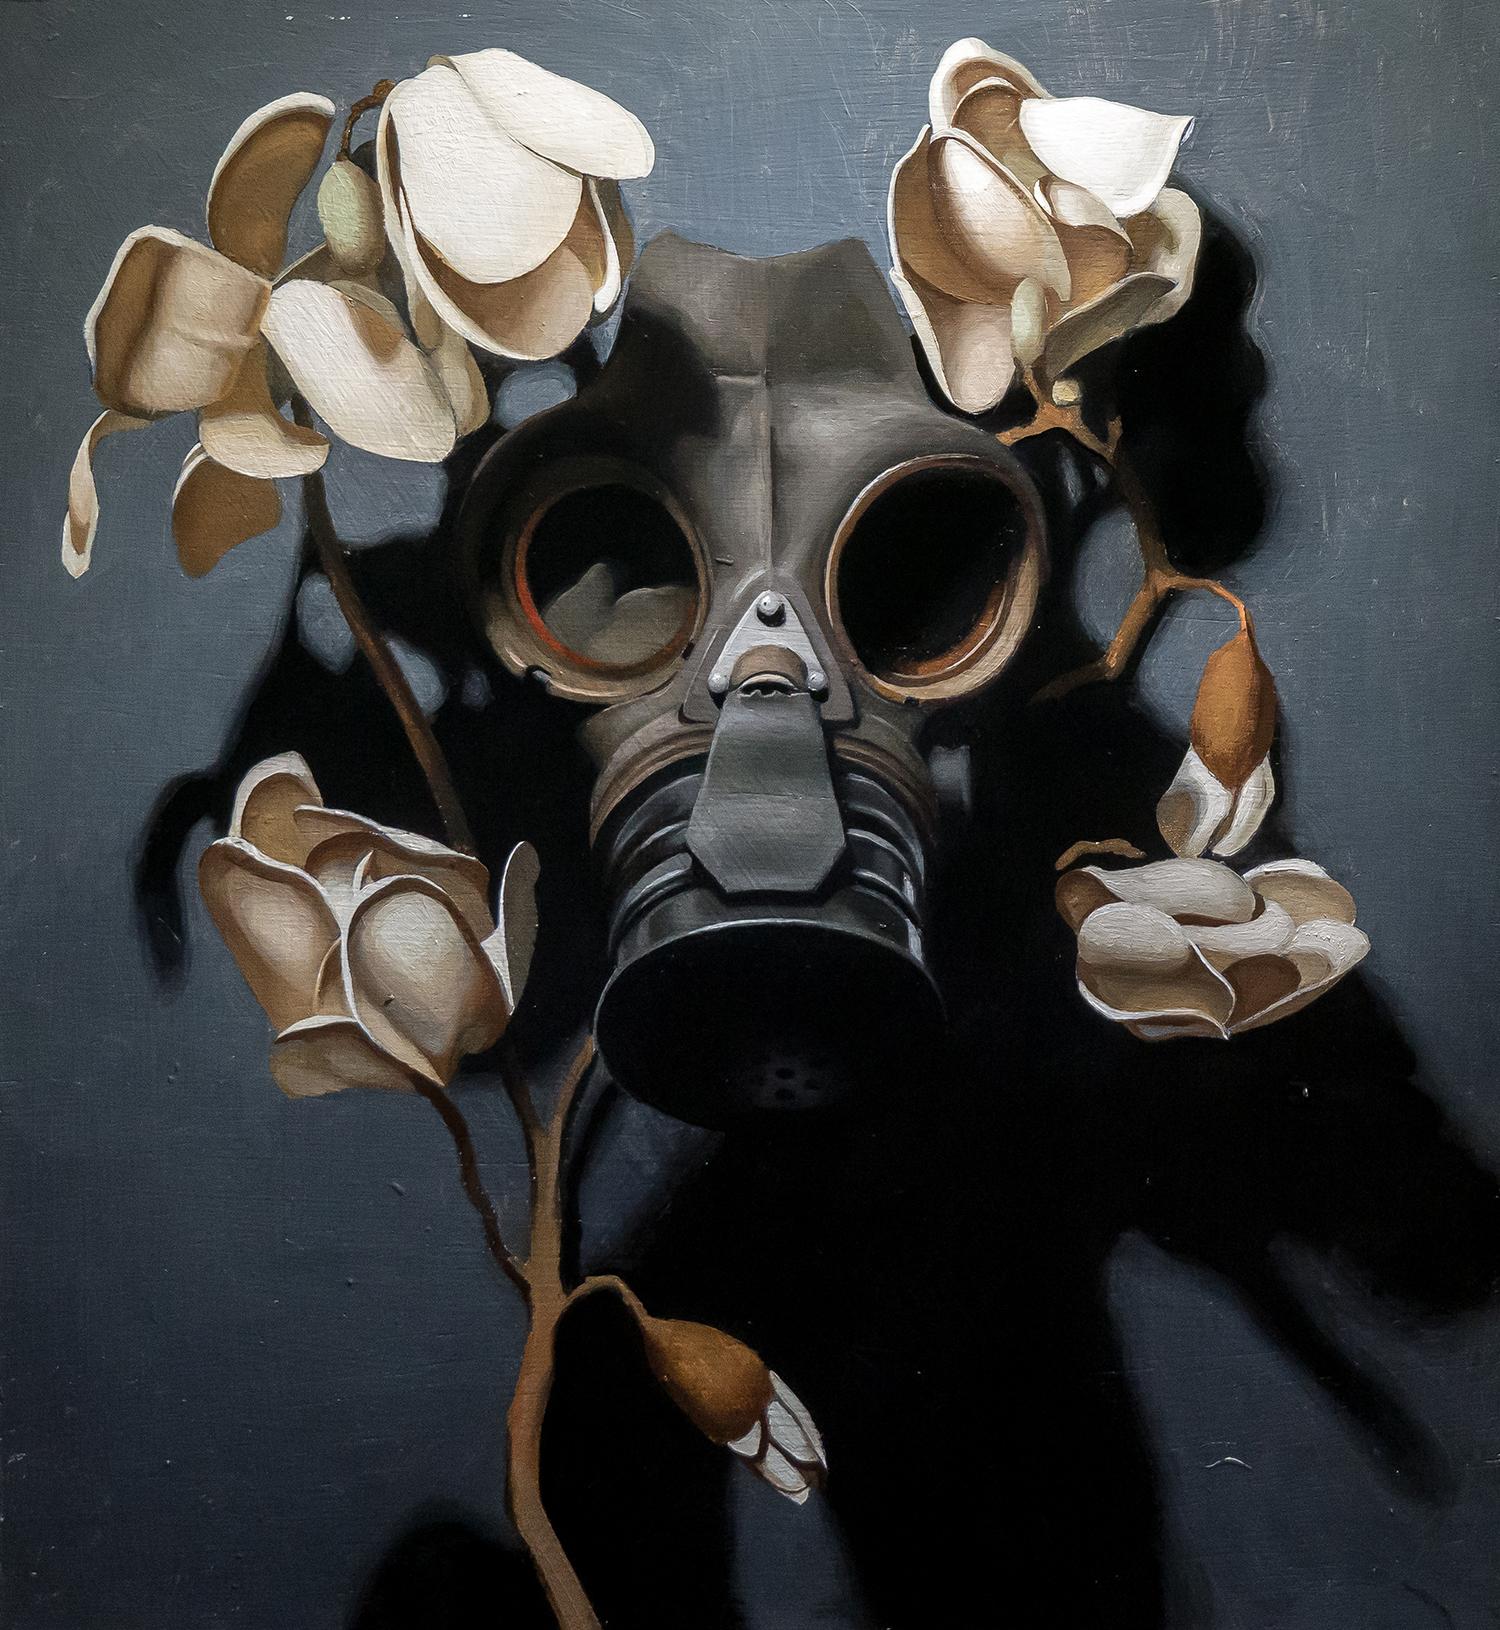 Kieran Ingram, Pale Carnage, Oil on Panel, 36cm x 40cm x 3cm,  http://www.kieraningram.com